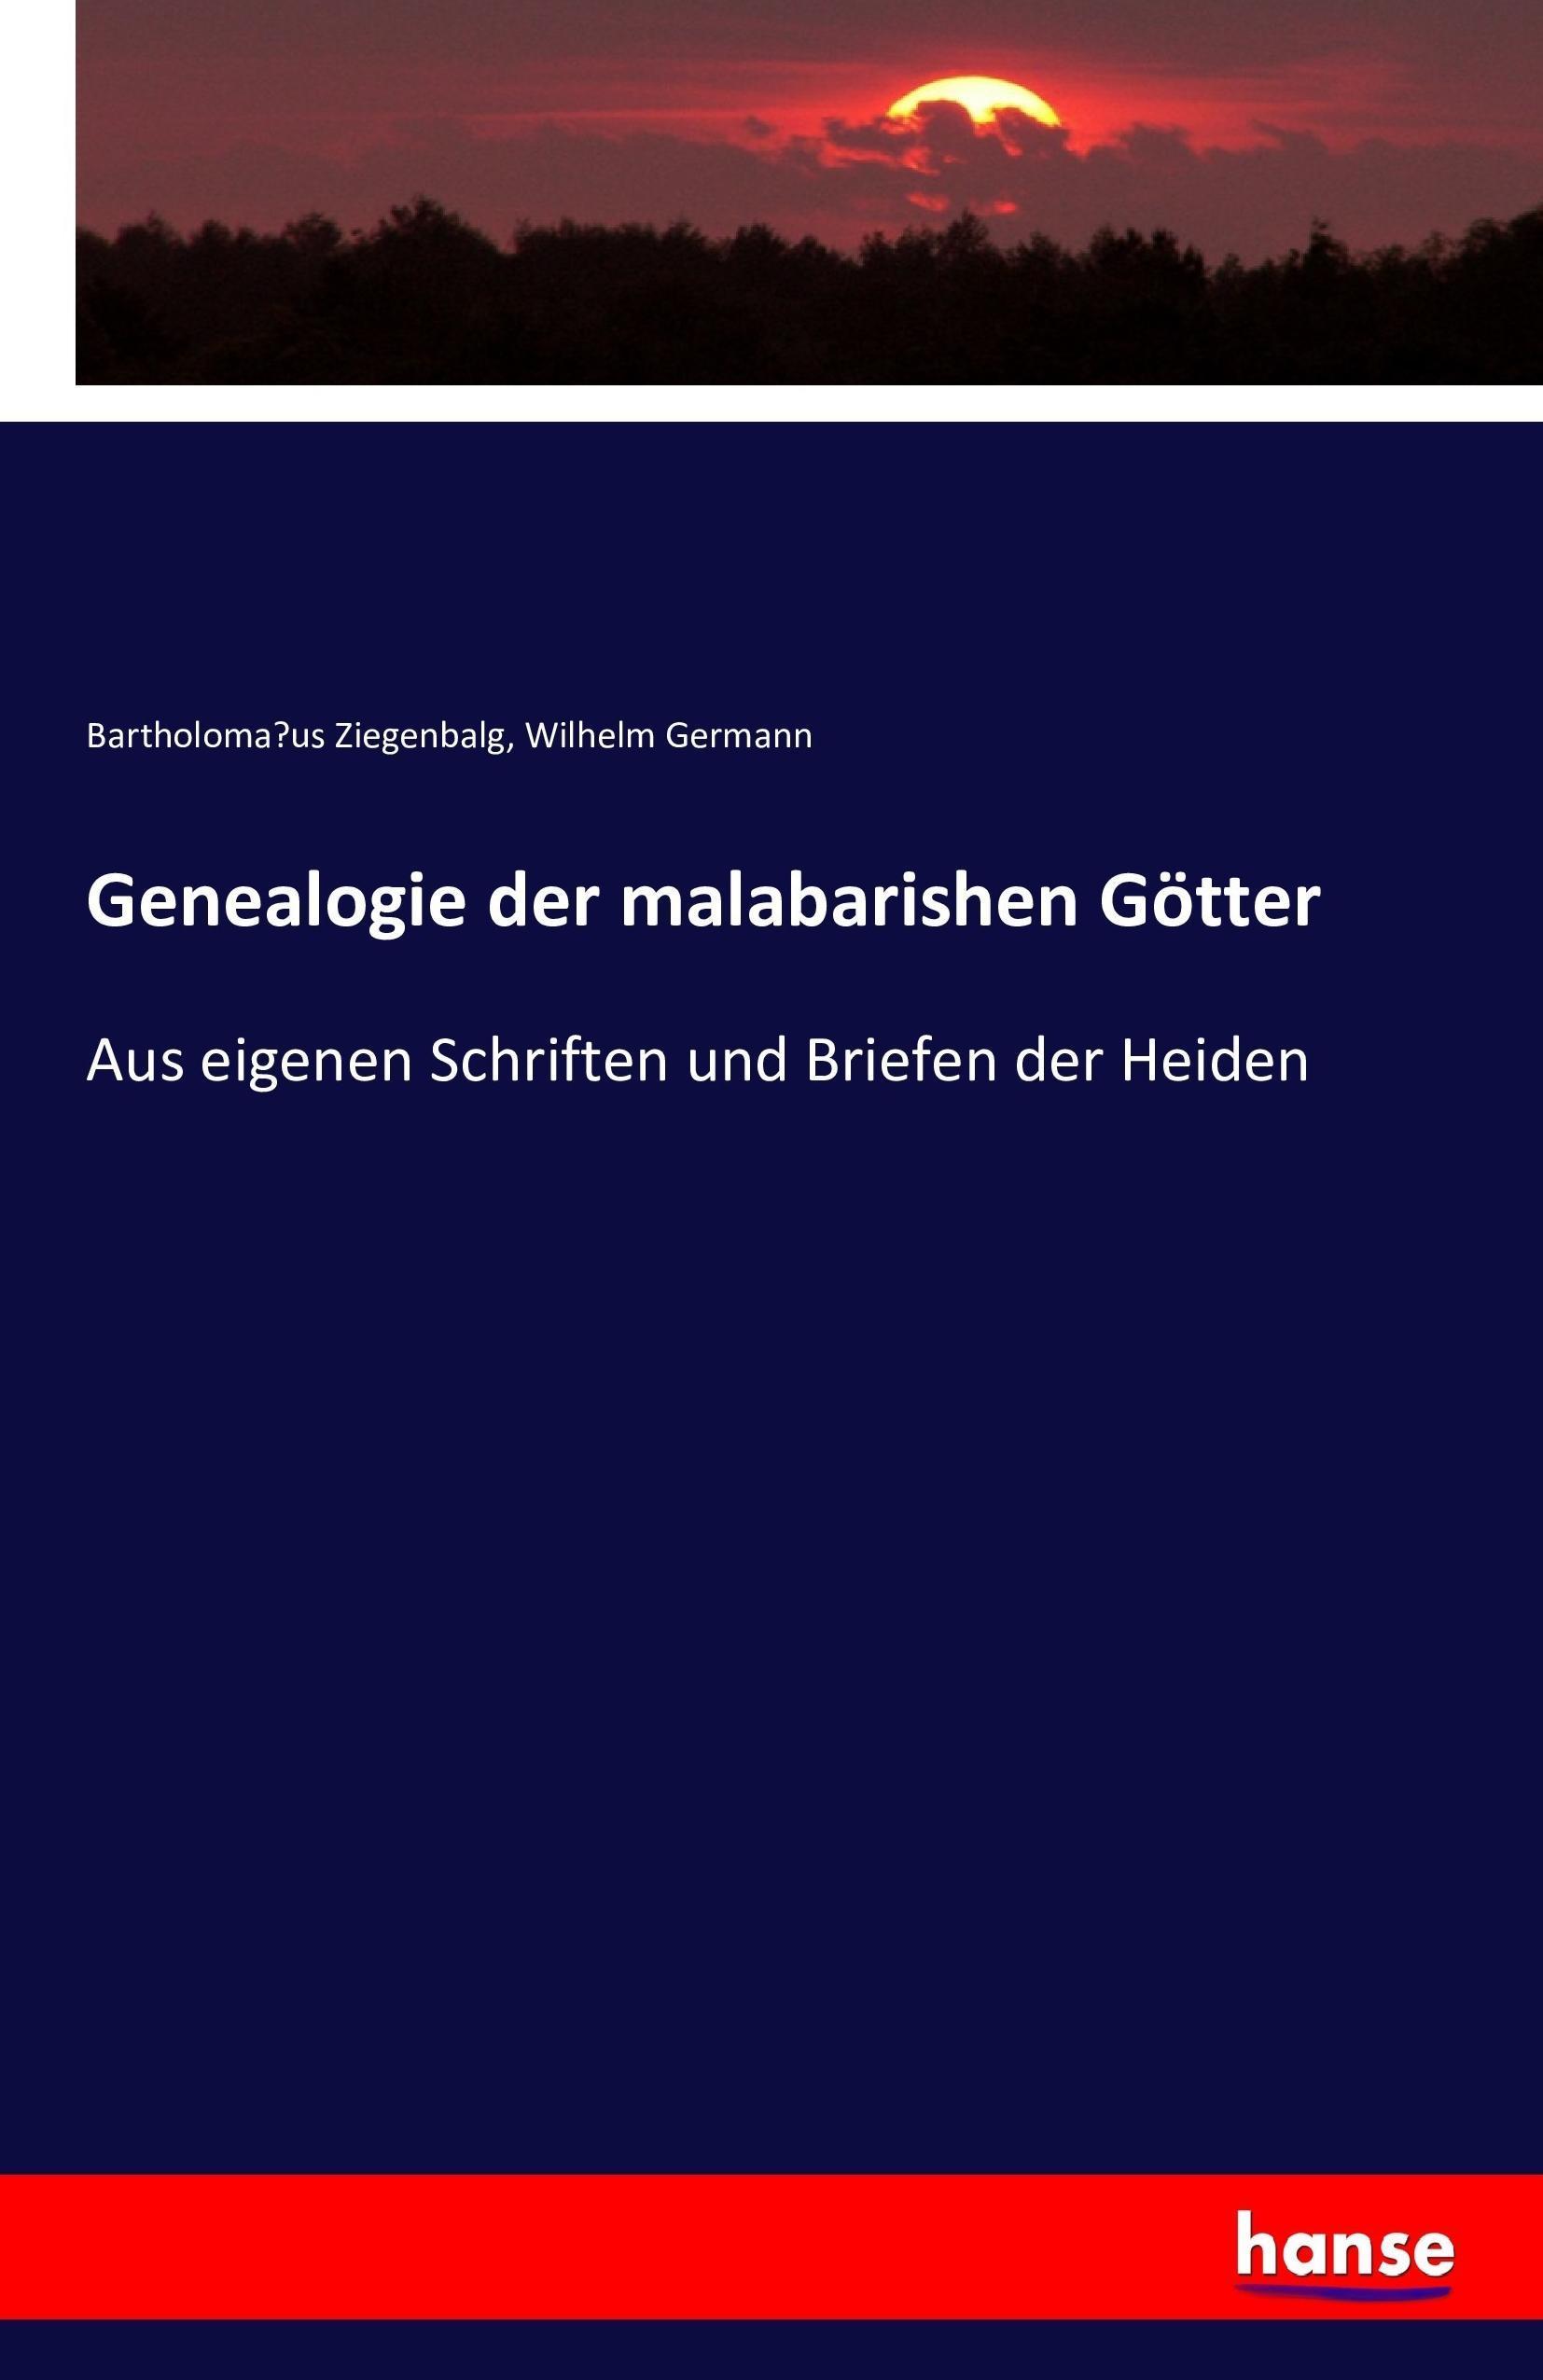 Bartholoma¨us Ziegenbalg / Genealogie der malabarishen Götter 9783741167591